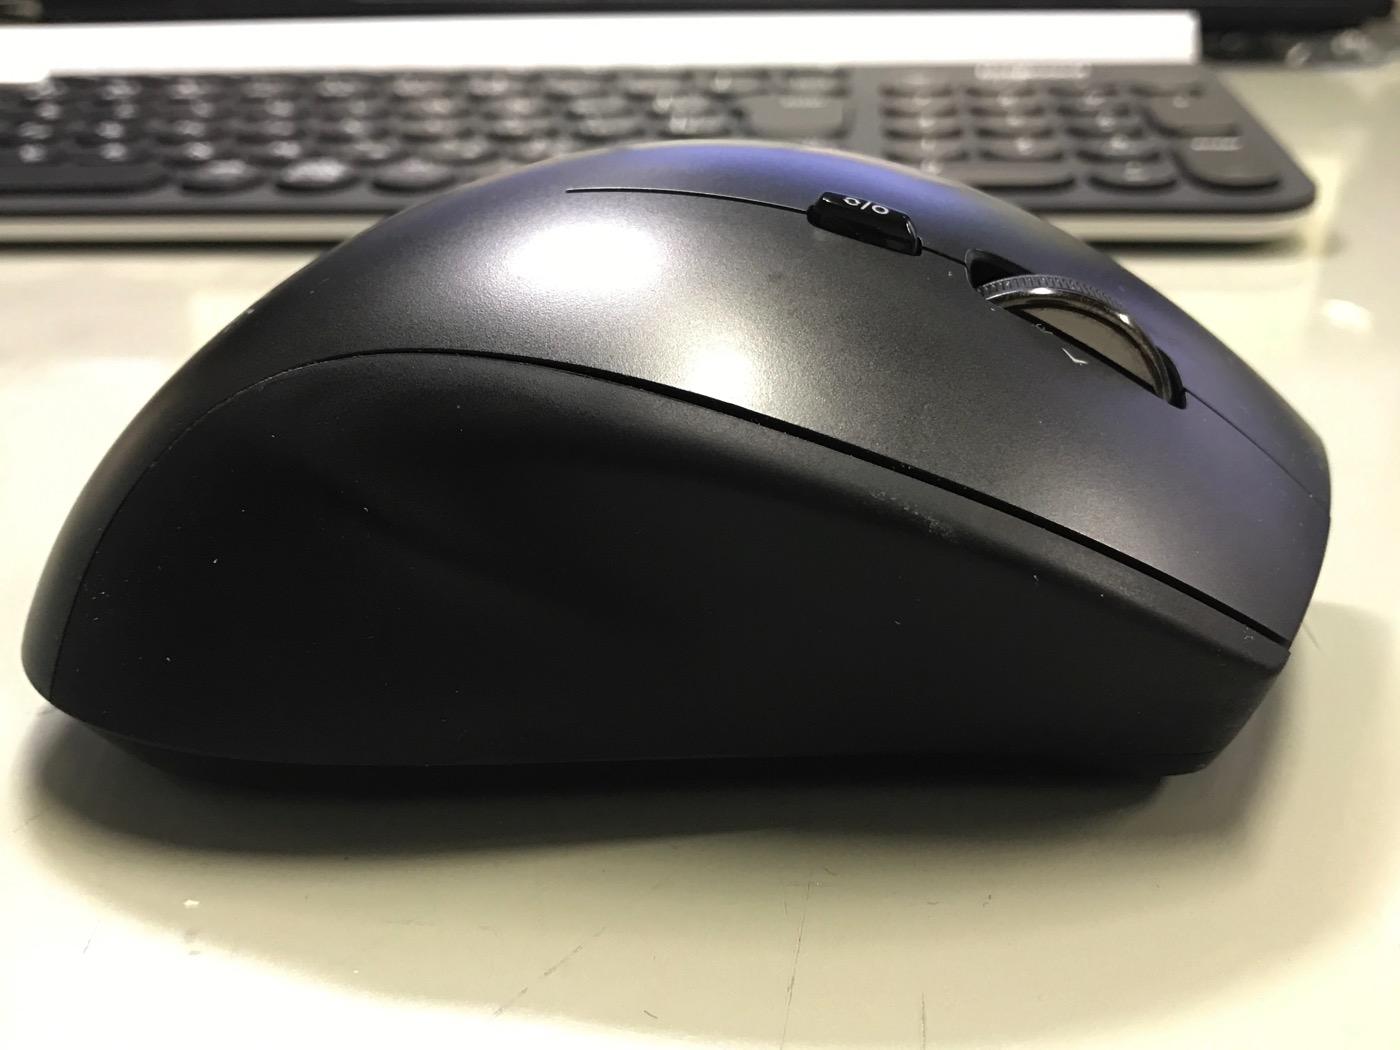 Logicool Mouse-4